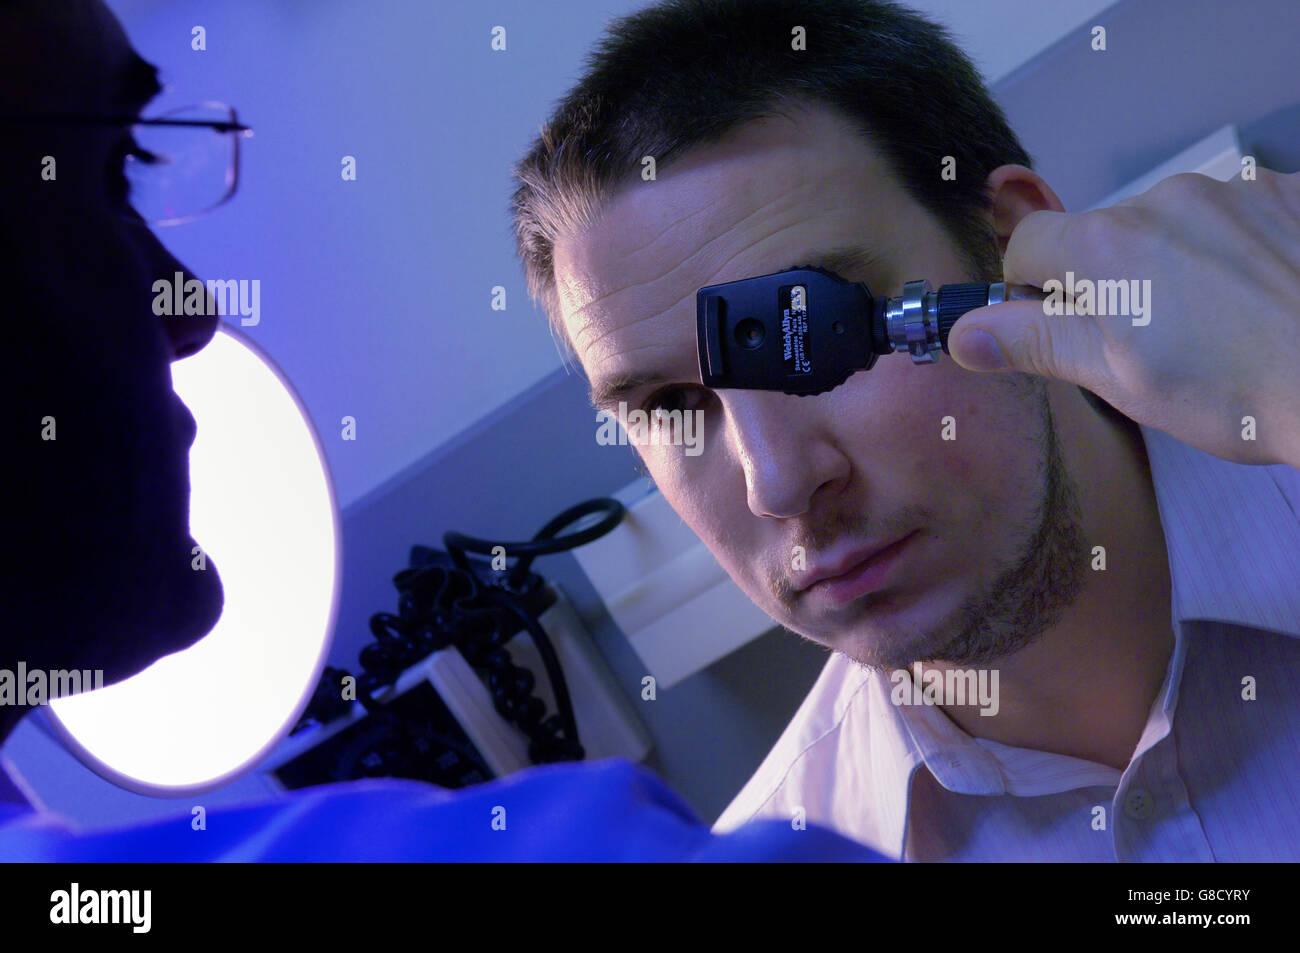 Eye examination using a Ophthalmoscope Stock Photo